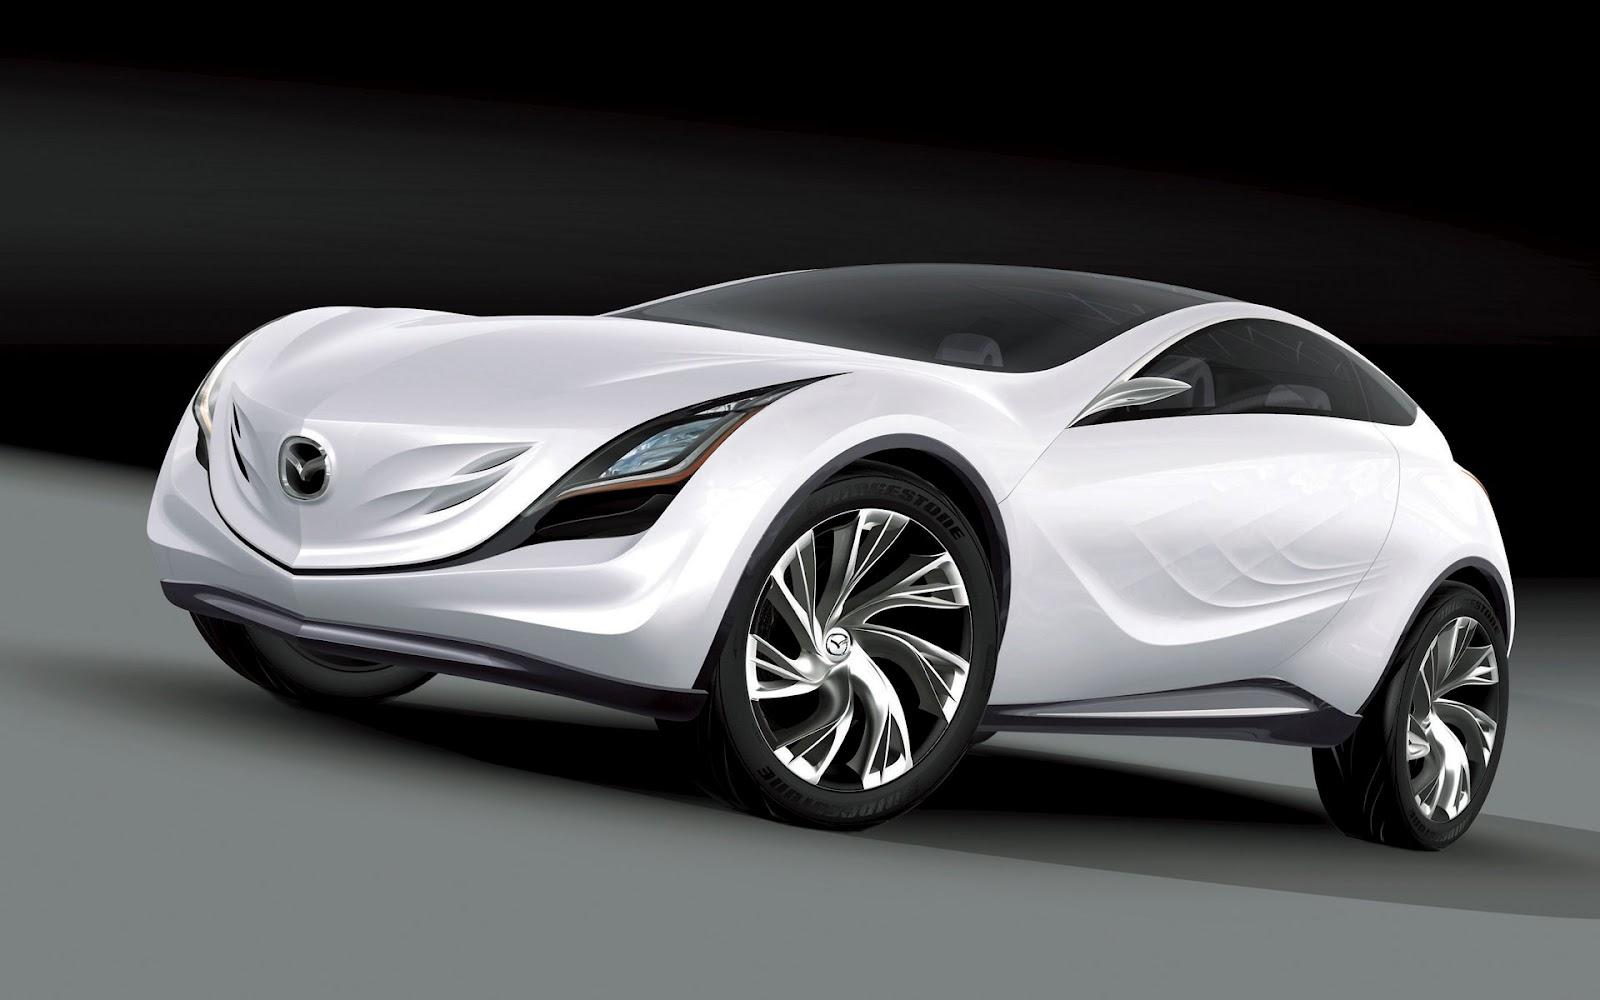 Sport Wallpaper Automobile: Stylish Hot Cars ~ Stylish Hot Cars